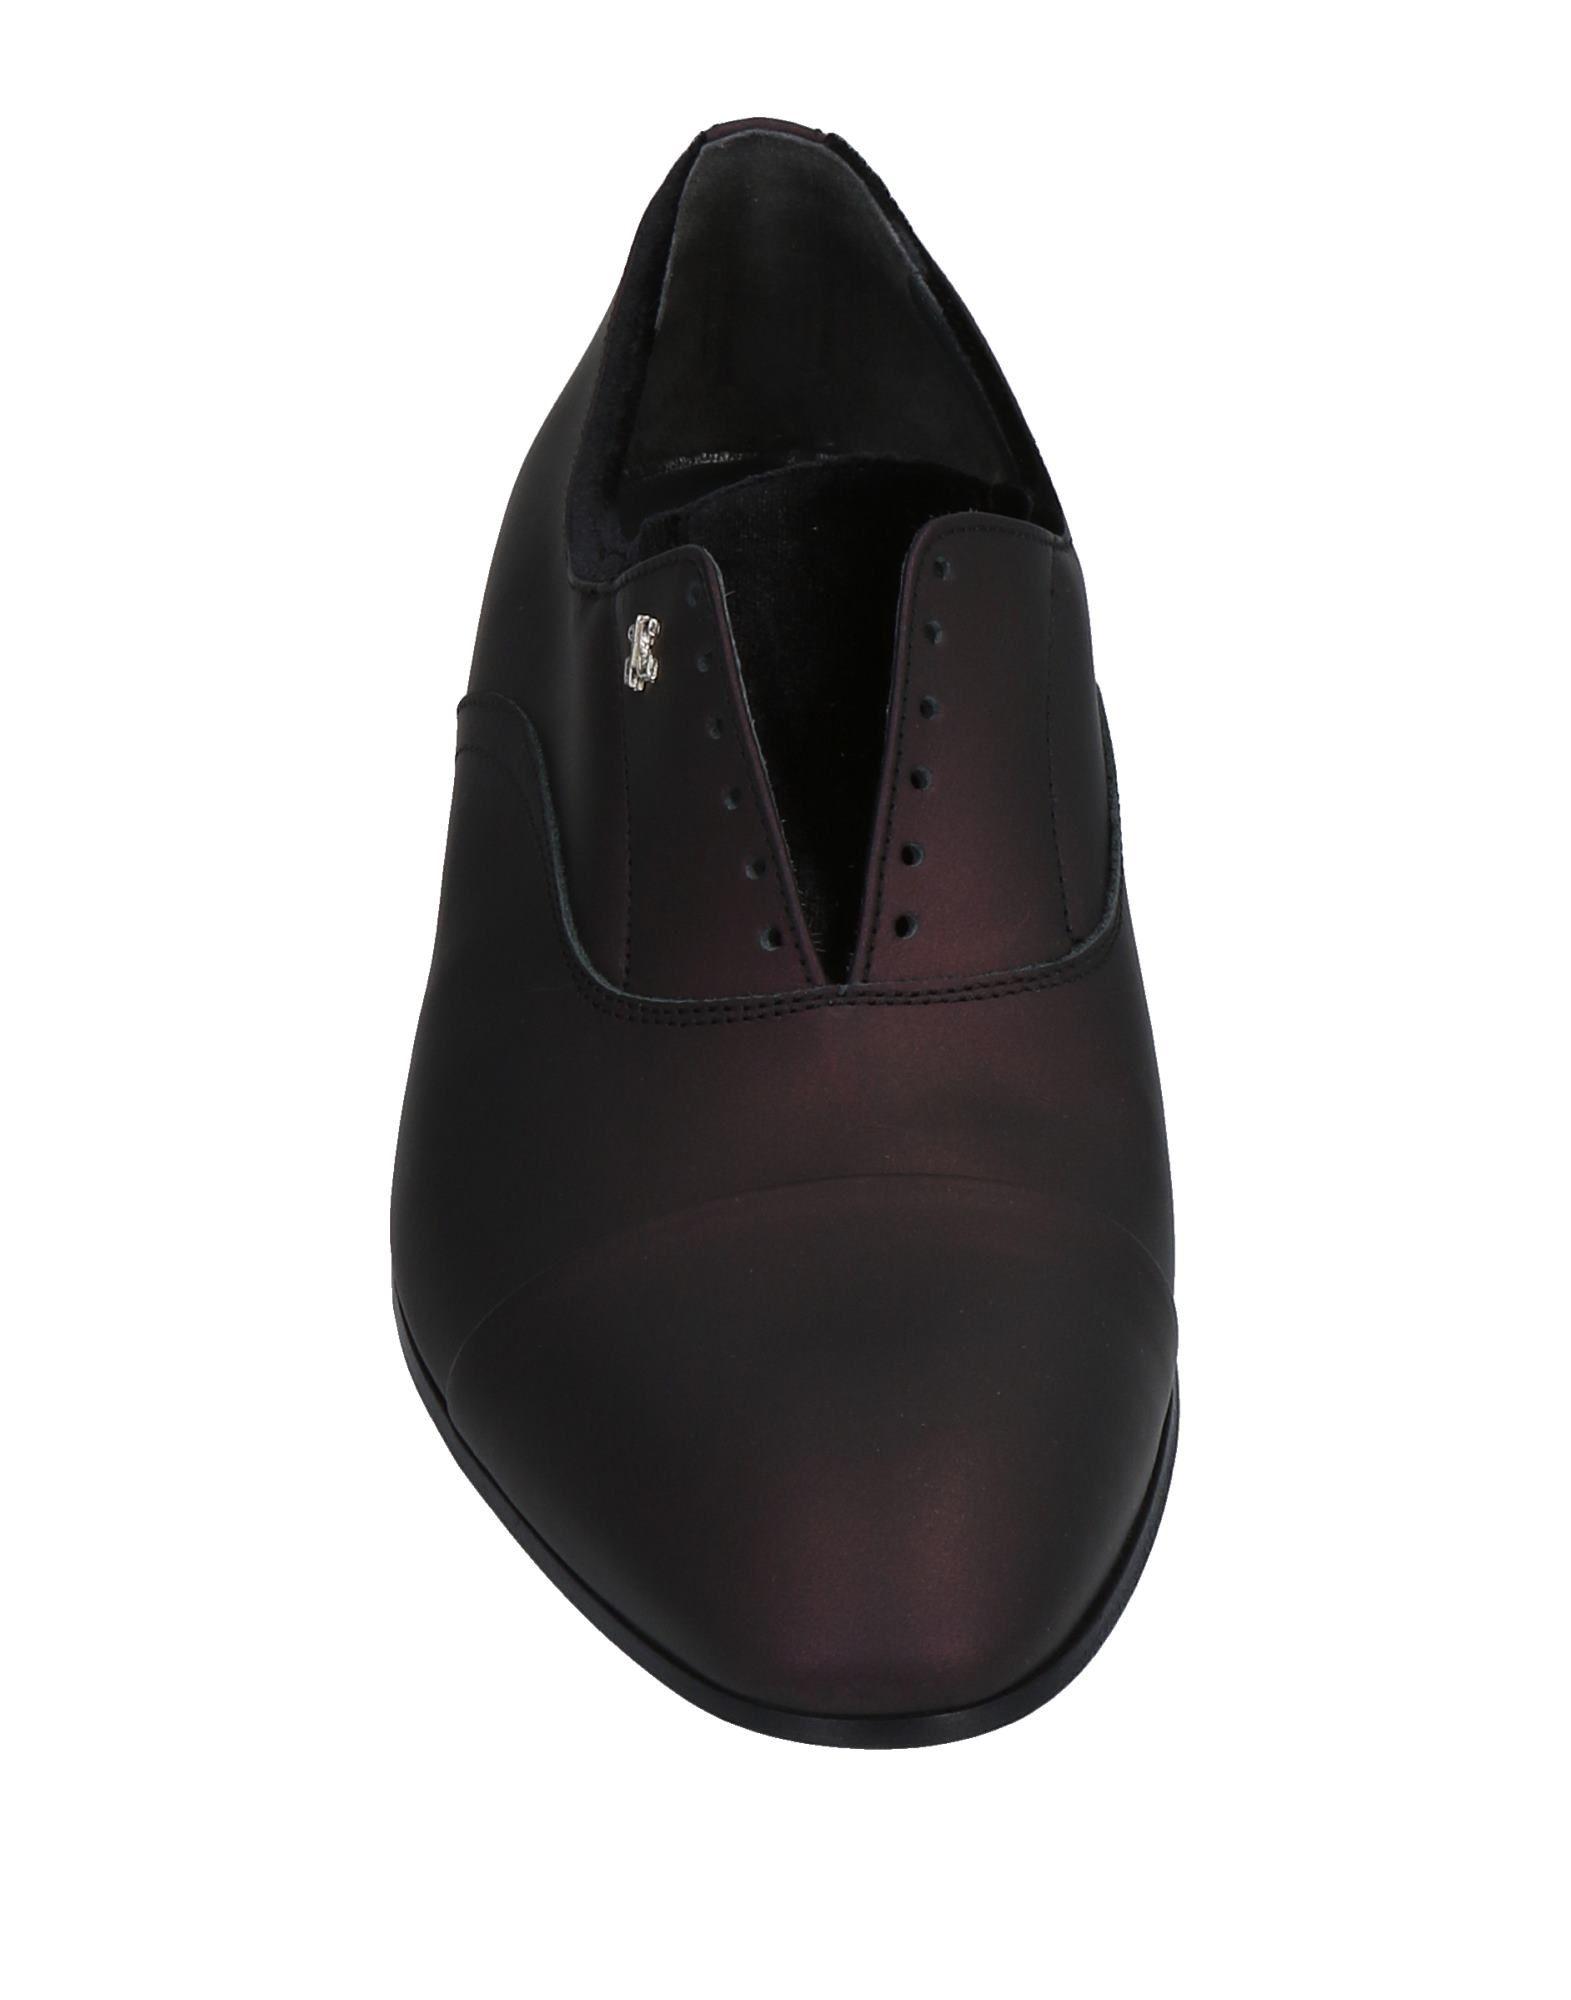 Giovanni Conti Gute Mokassins Herren  11471639UA Gute Conti Qualität beliebte Schuhe 9943b0